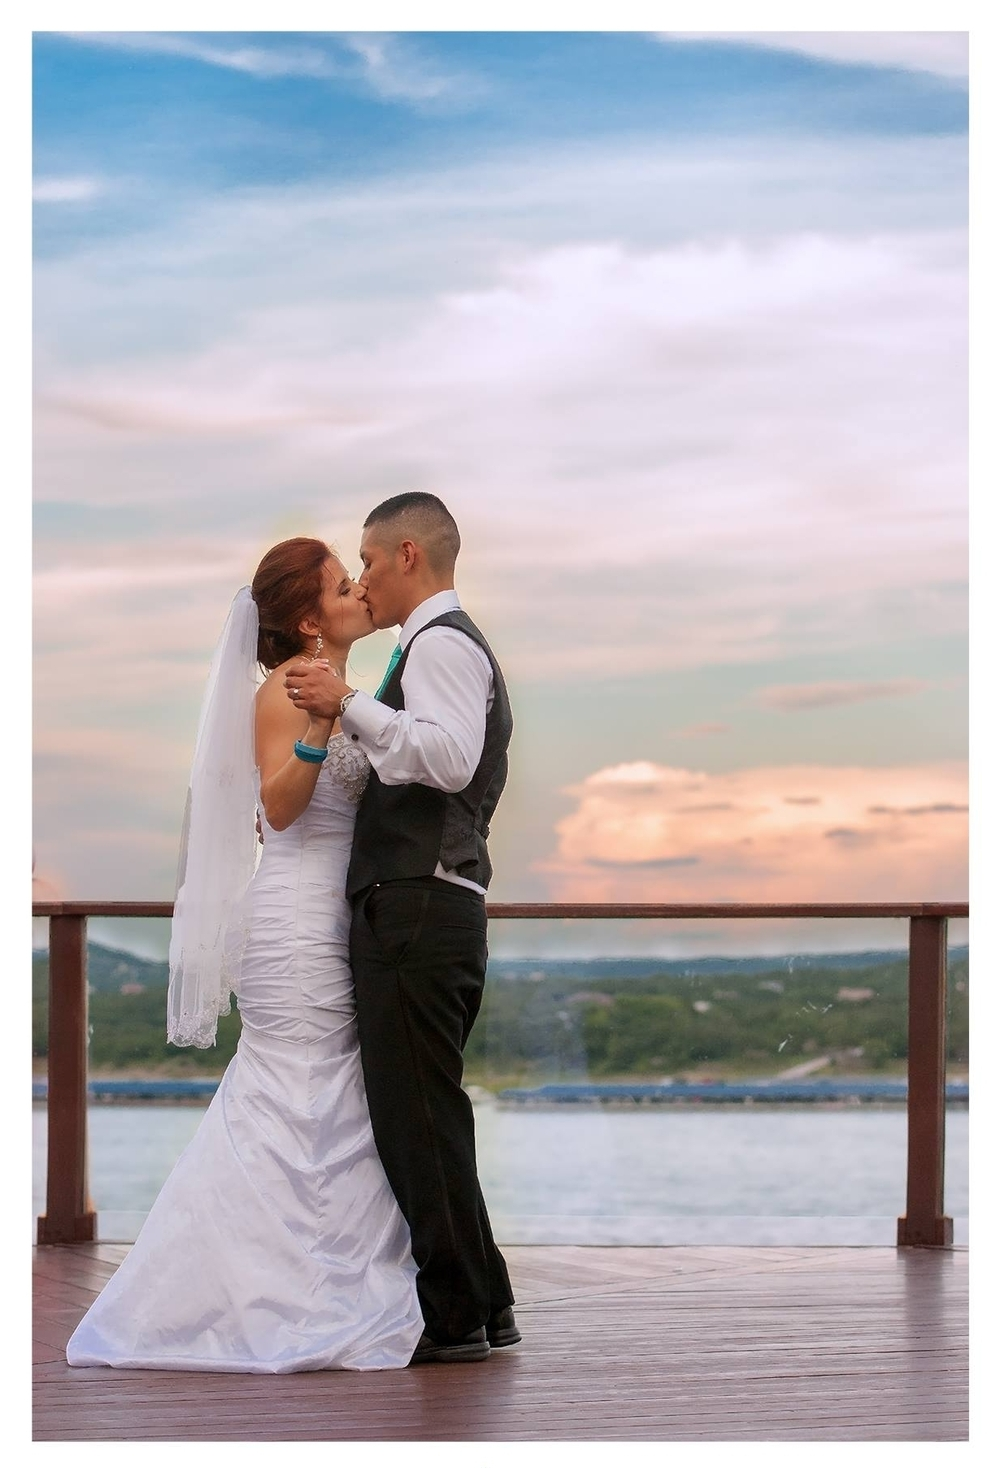 Lake Travis Destination Wedding Photography